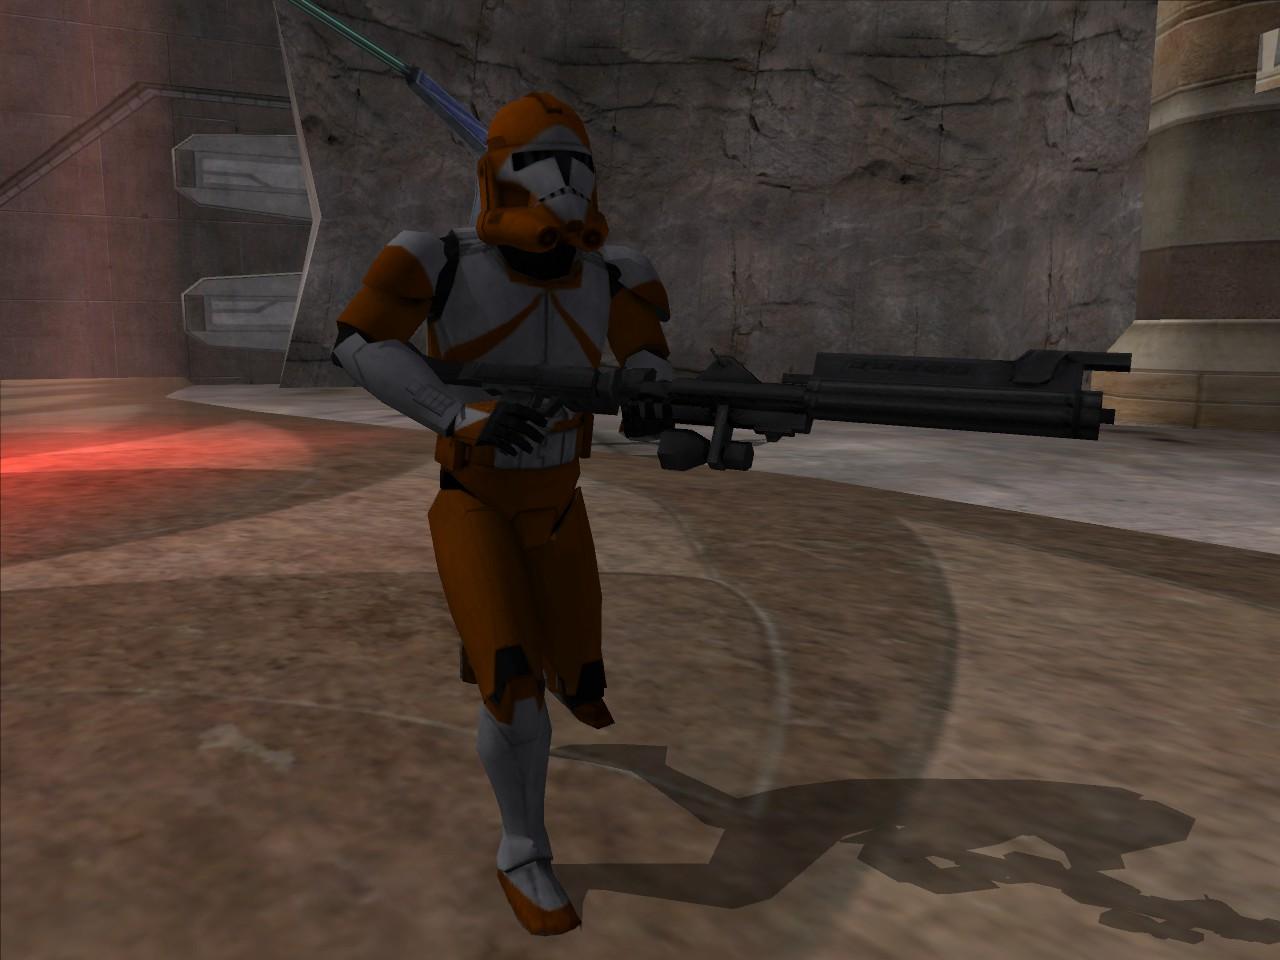 212th Ordnance Trooper phase 2